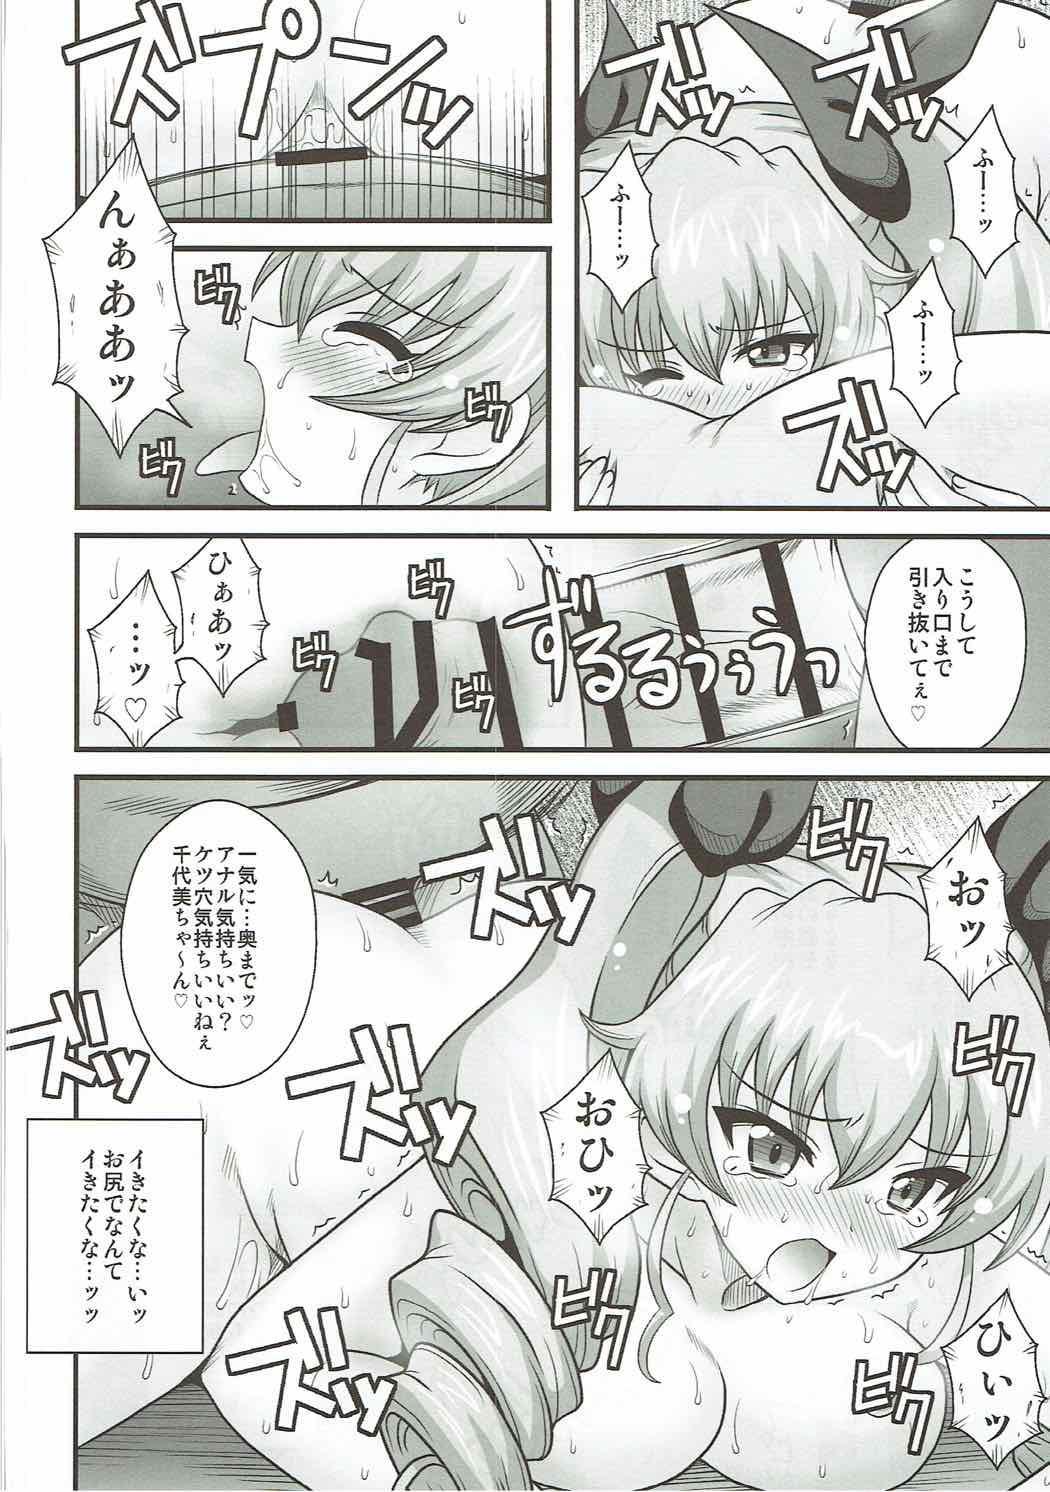 Anzio Enkou Chiyomi 17-sai 22